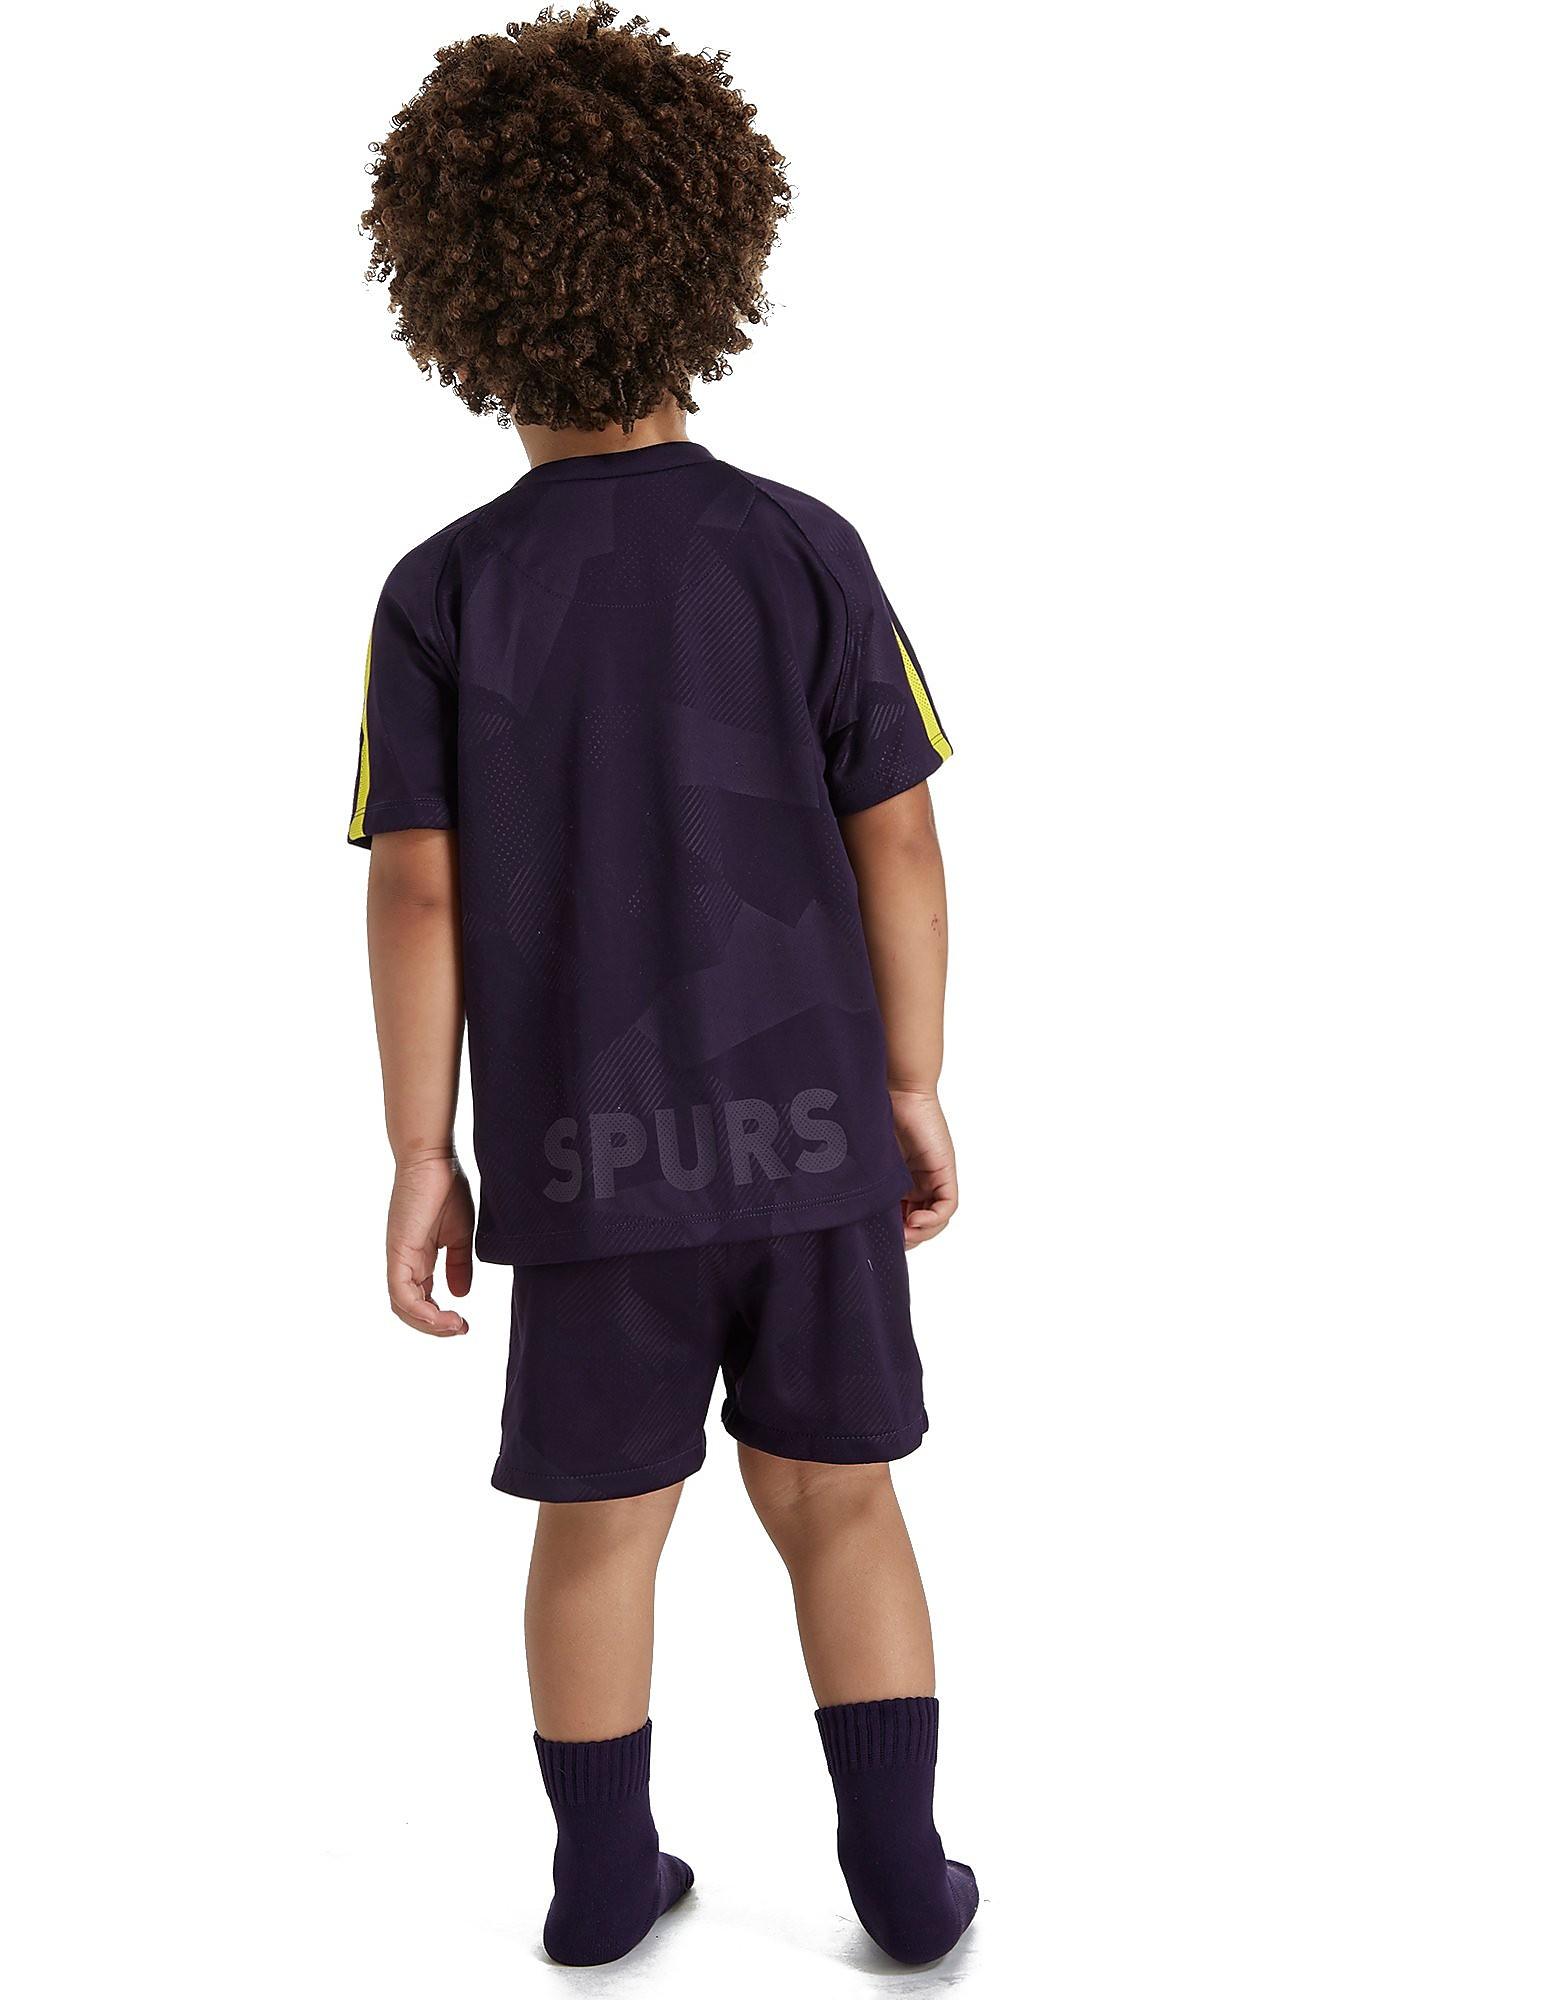 Nike Tottenham Hotspur FC 2017/18 Third Kit Infant